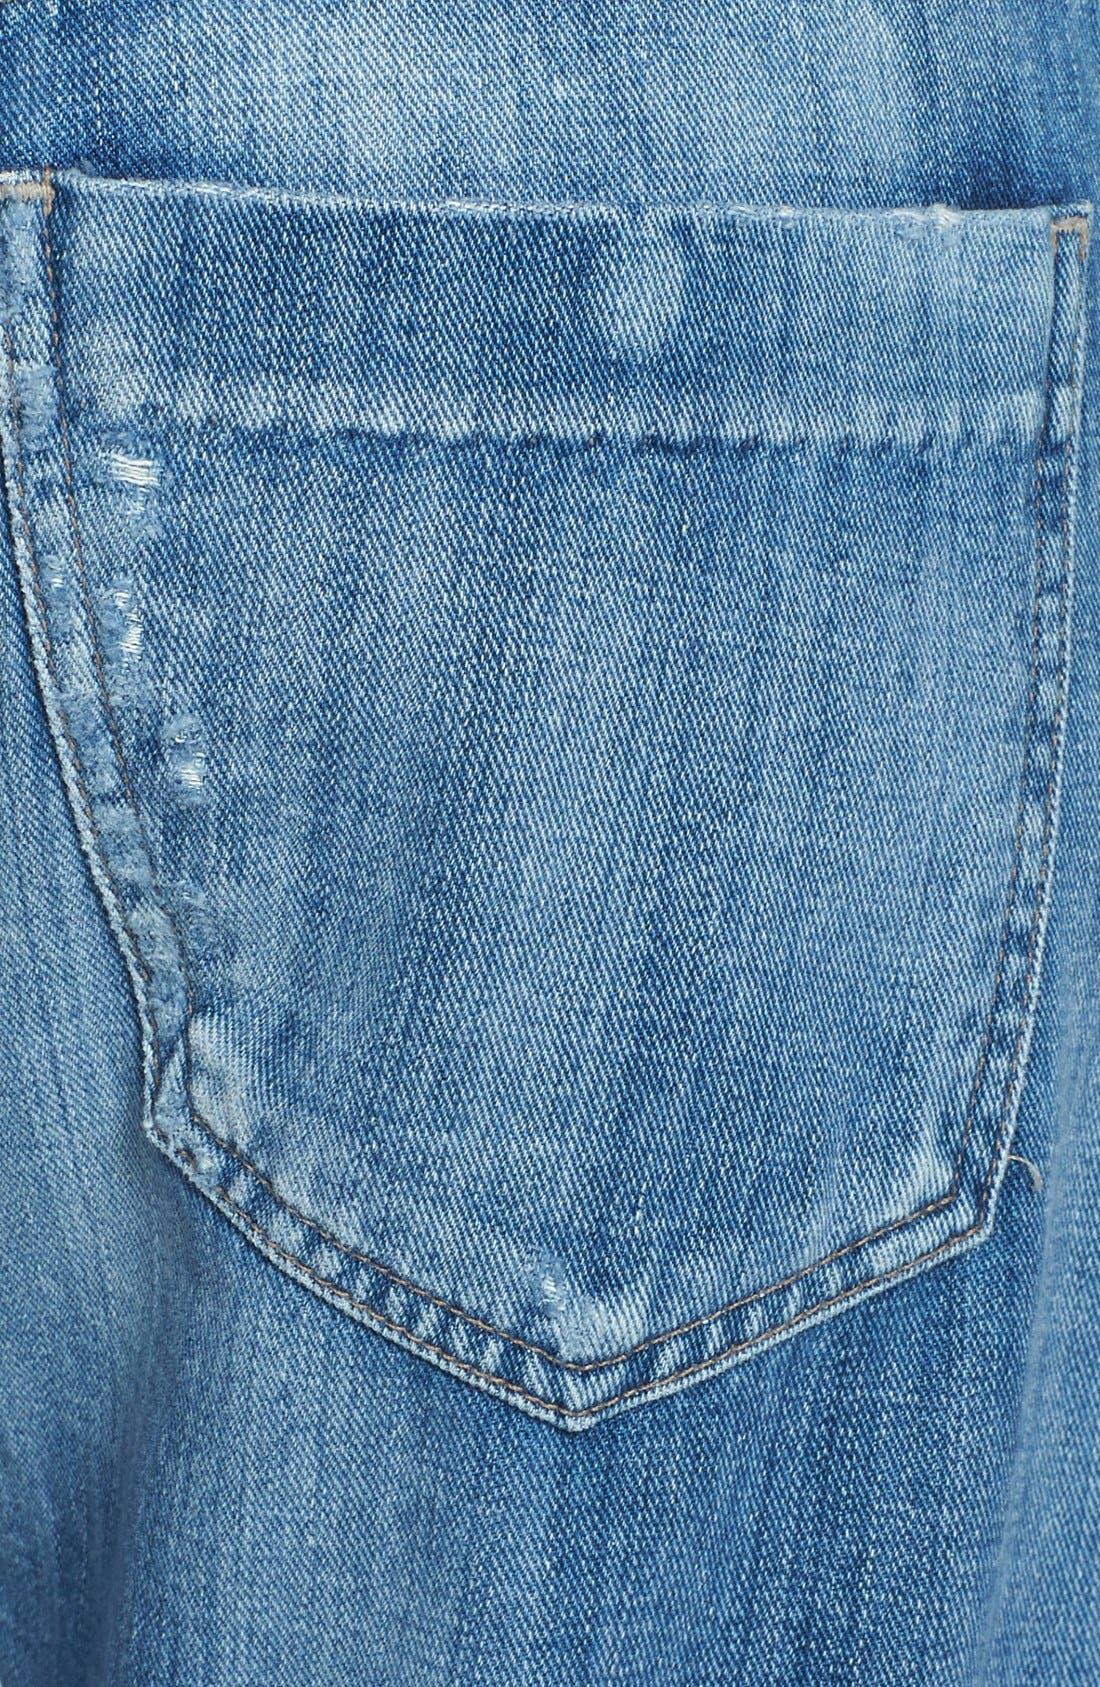 Alternate Image 3  - Citizens of Humanity 'Skylar' Crop Boyfriend Jeans (Circa)